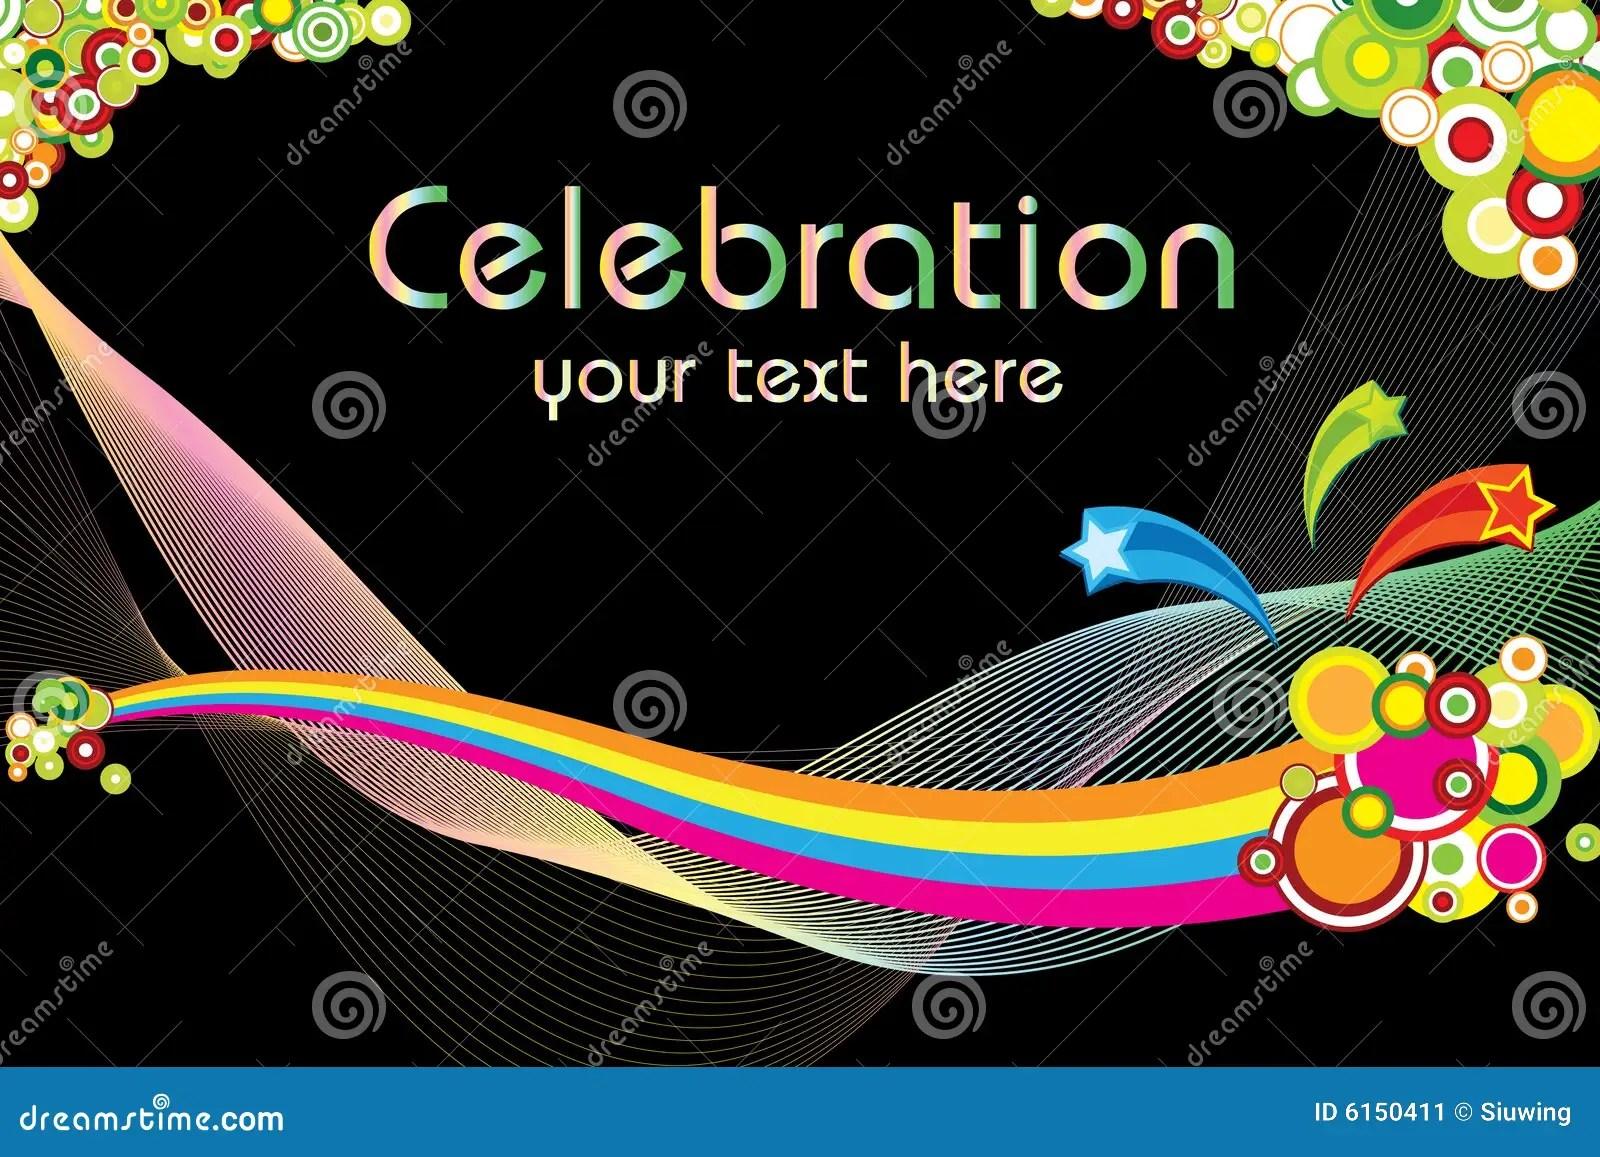 Beautiful Wallpapers 3d Animation Celebration Theme Stock Image Image 6150411